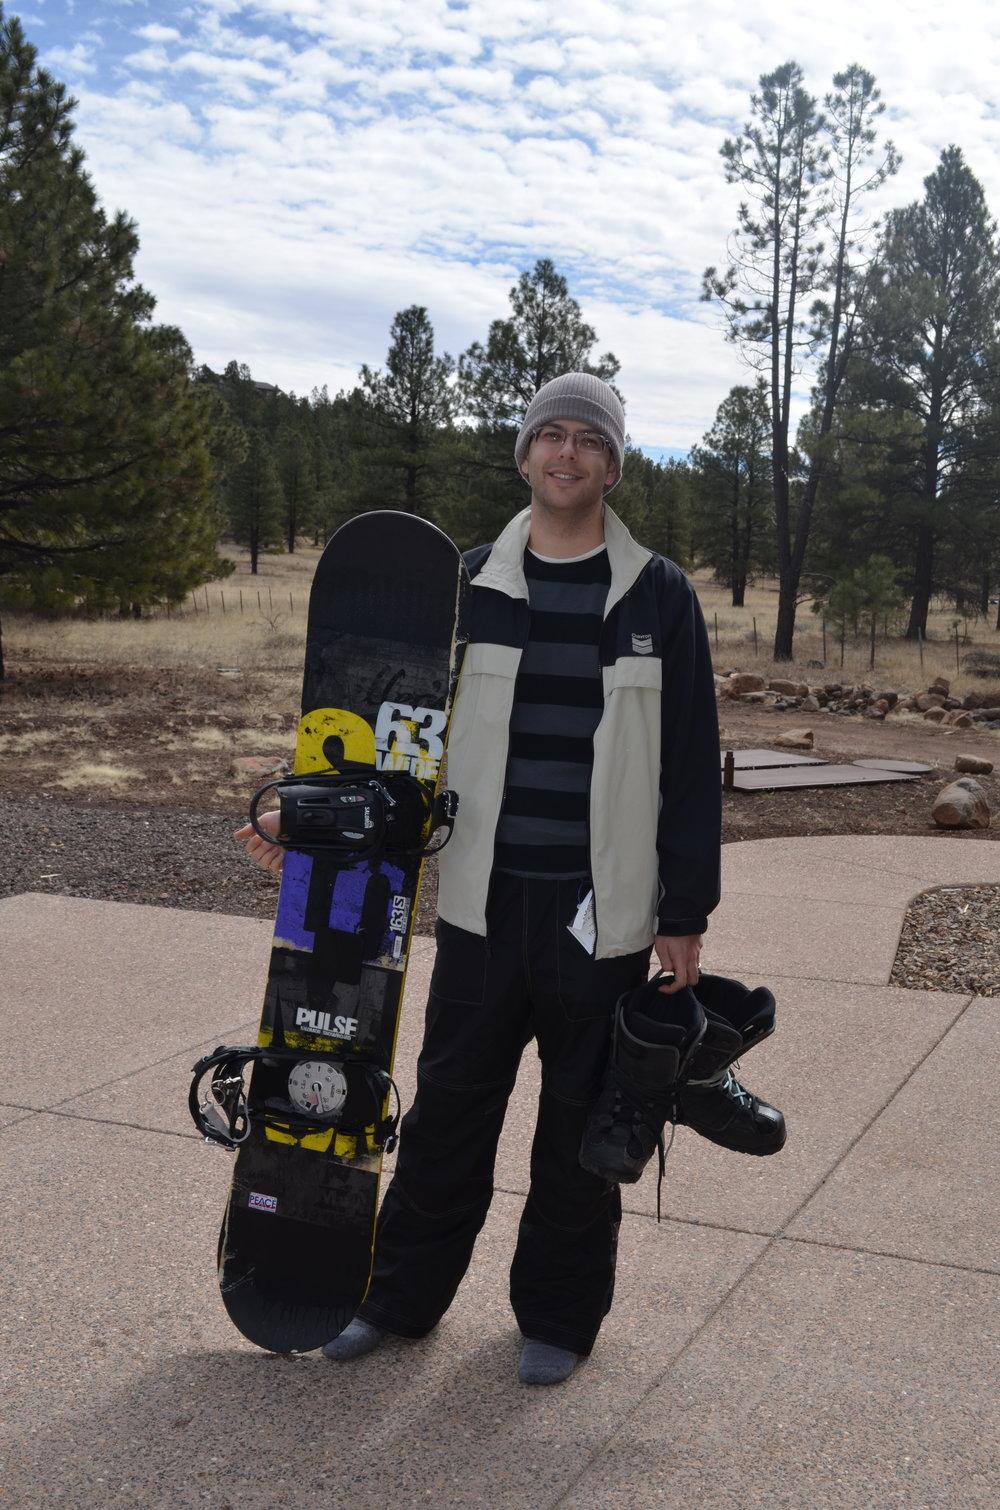 Snowboarding near Daniel's parent's house in Flagstaff